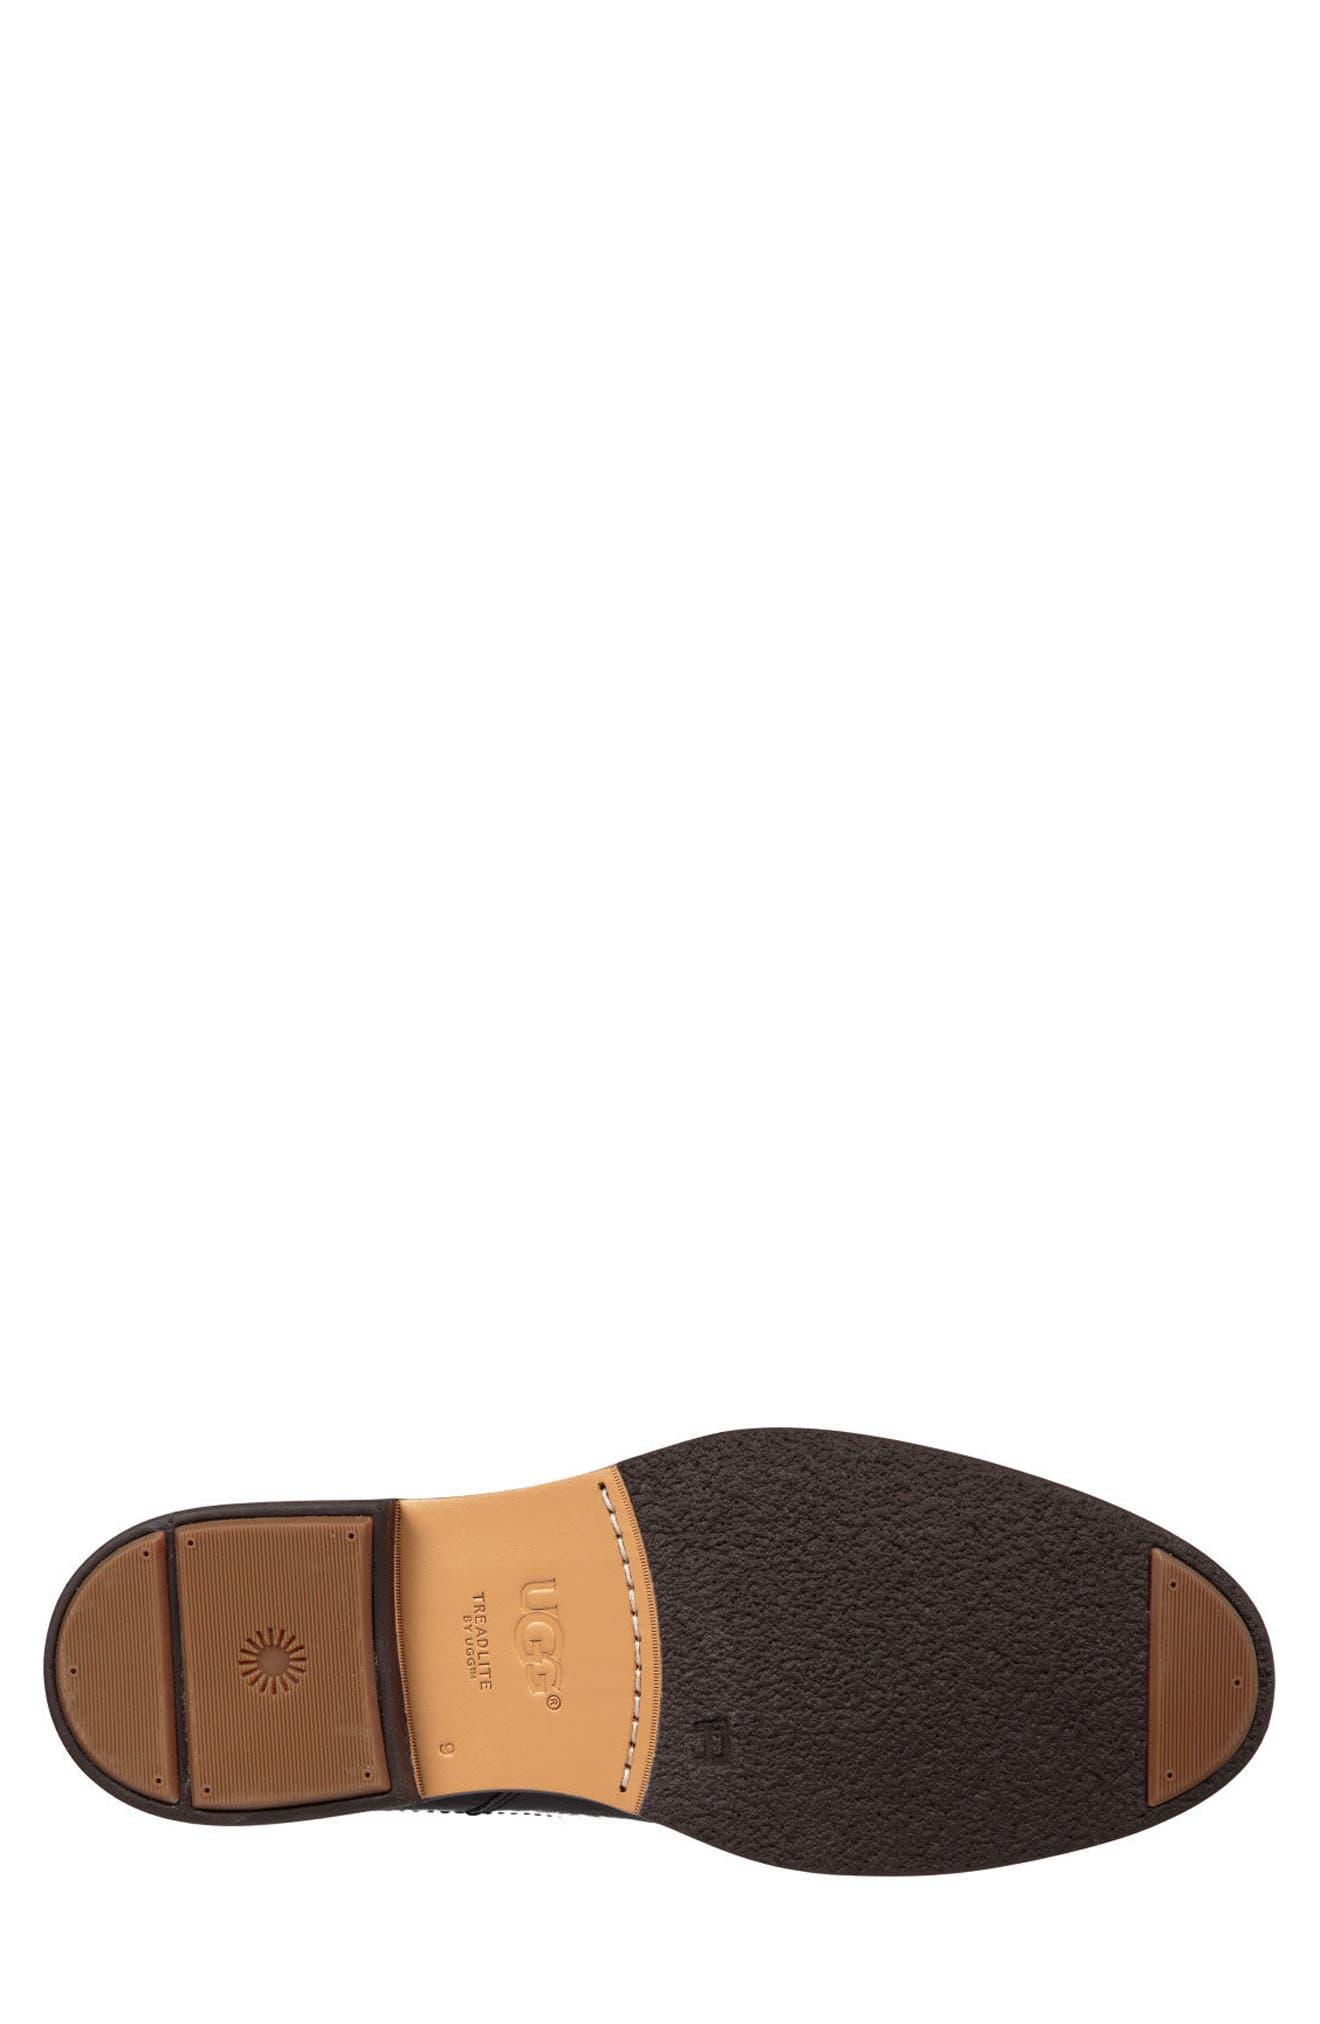 Baldvin Chelsea Boot,                             Alternate thumbnail 5, color,                             BLACK LEATHER/SUEDE